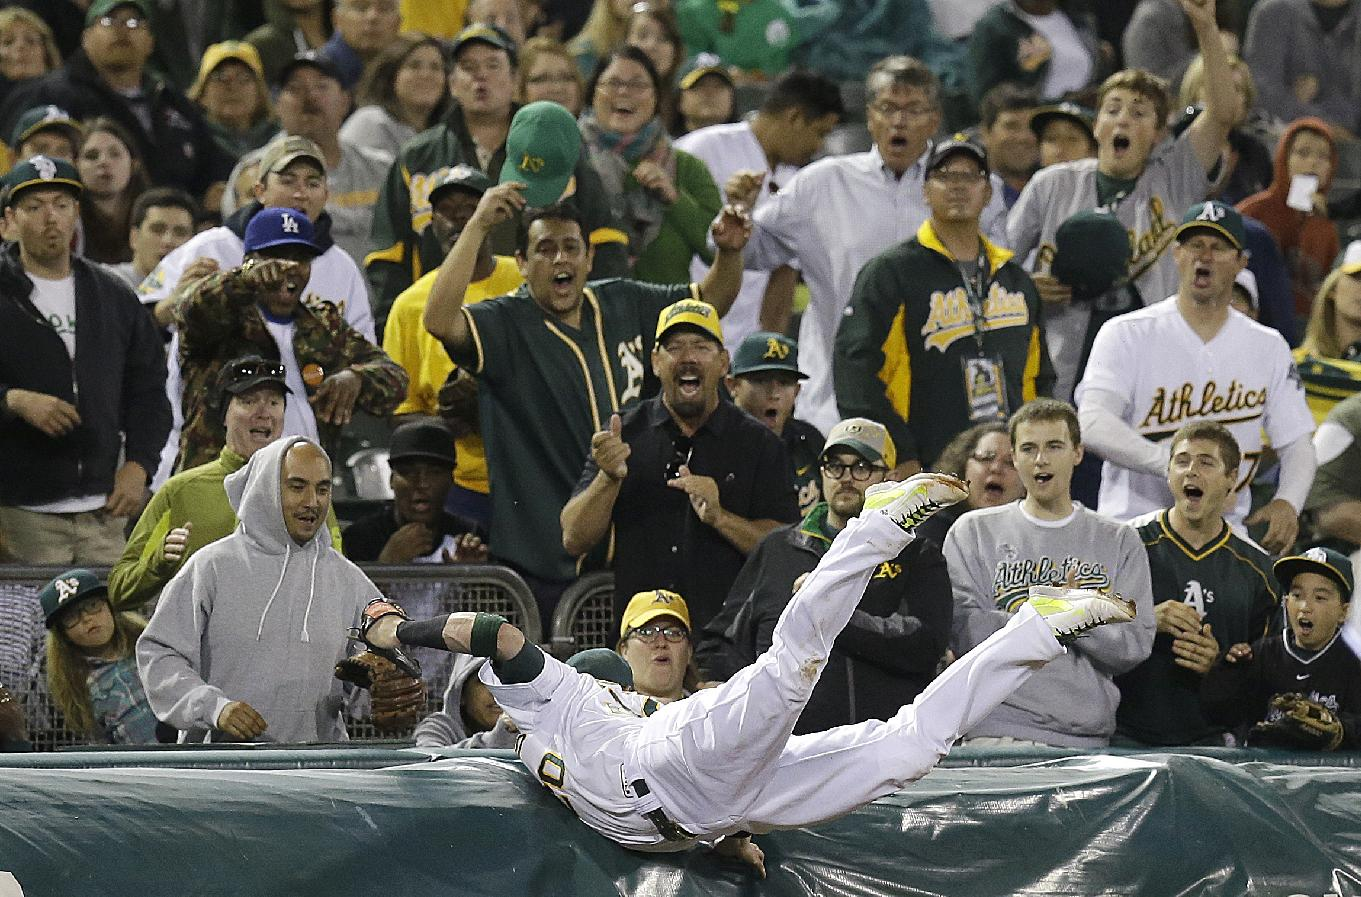 Josh Donaldson torpedoes into tarp, makes great catch —again (…